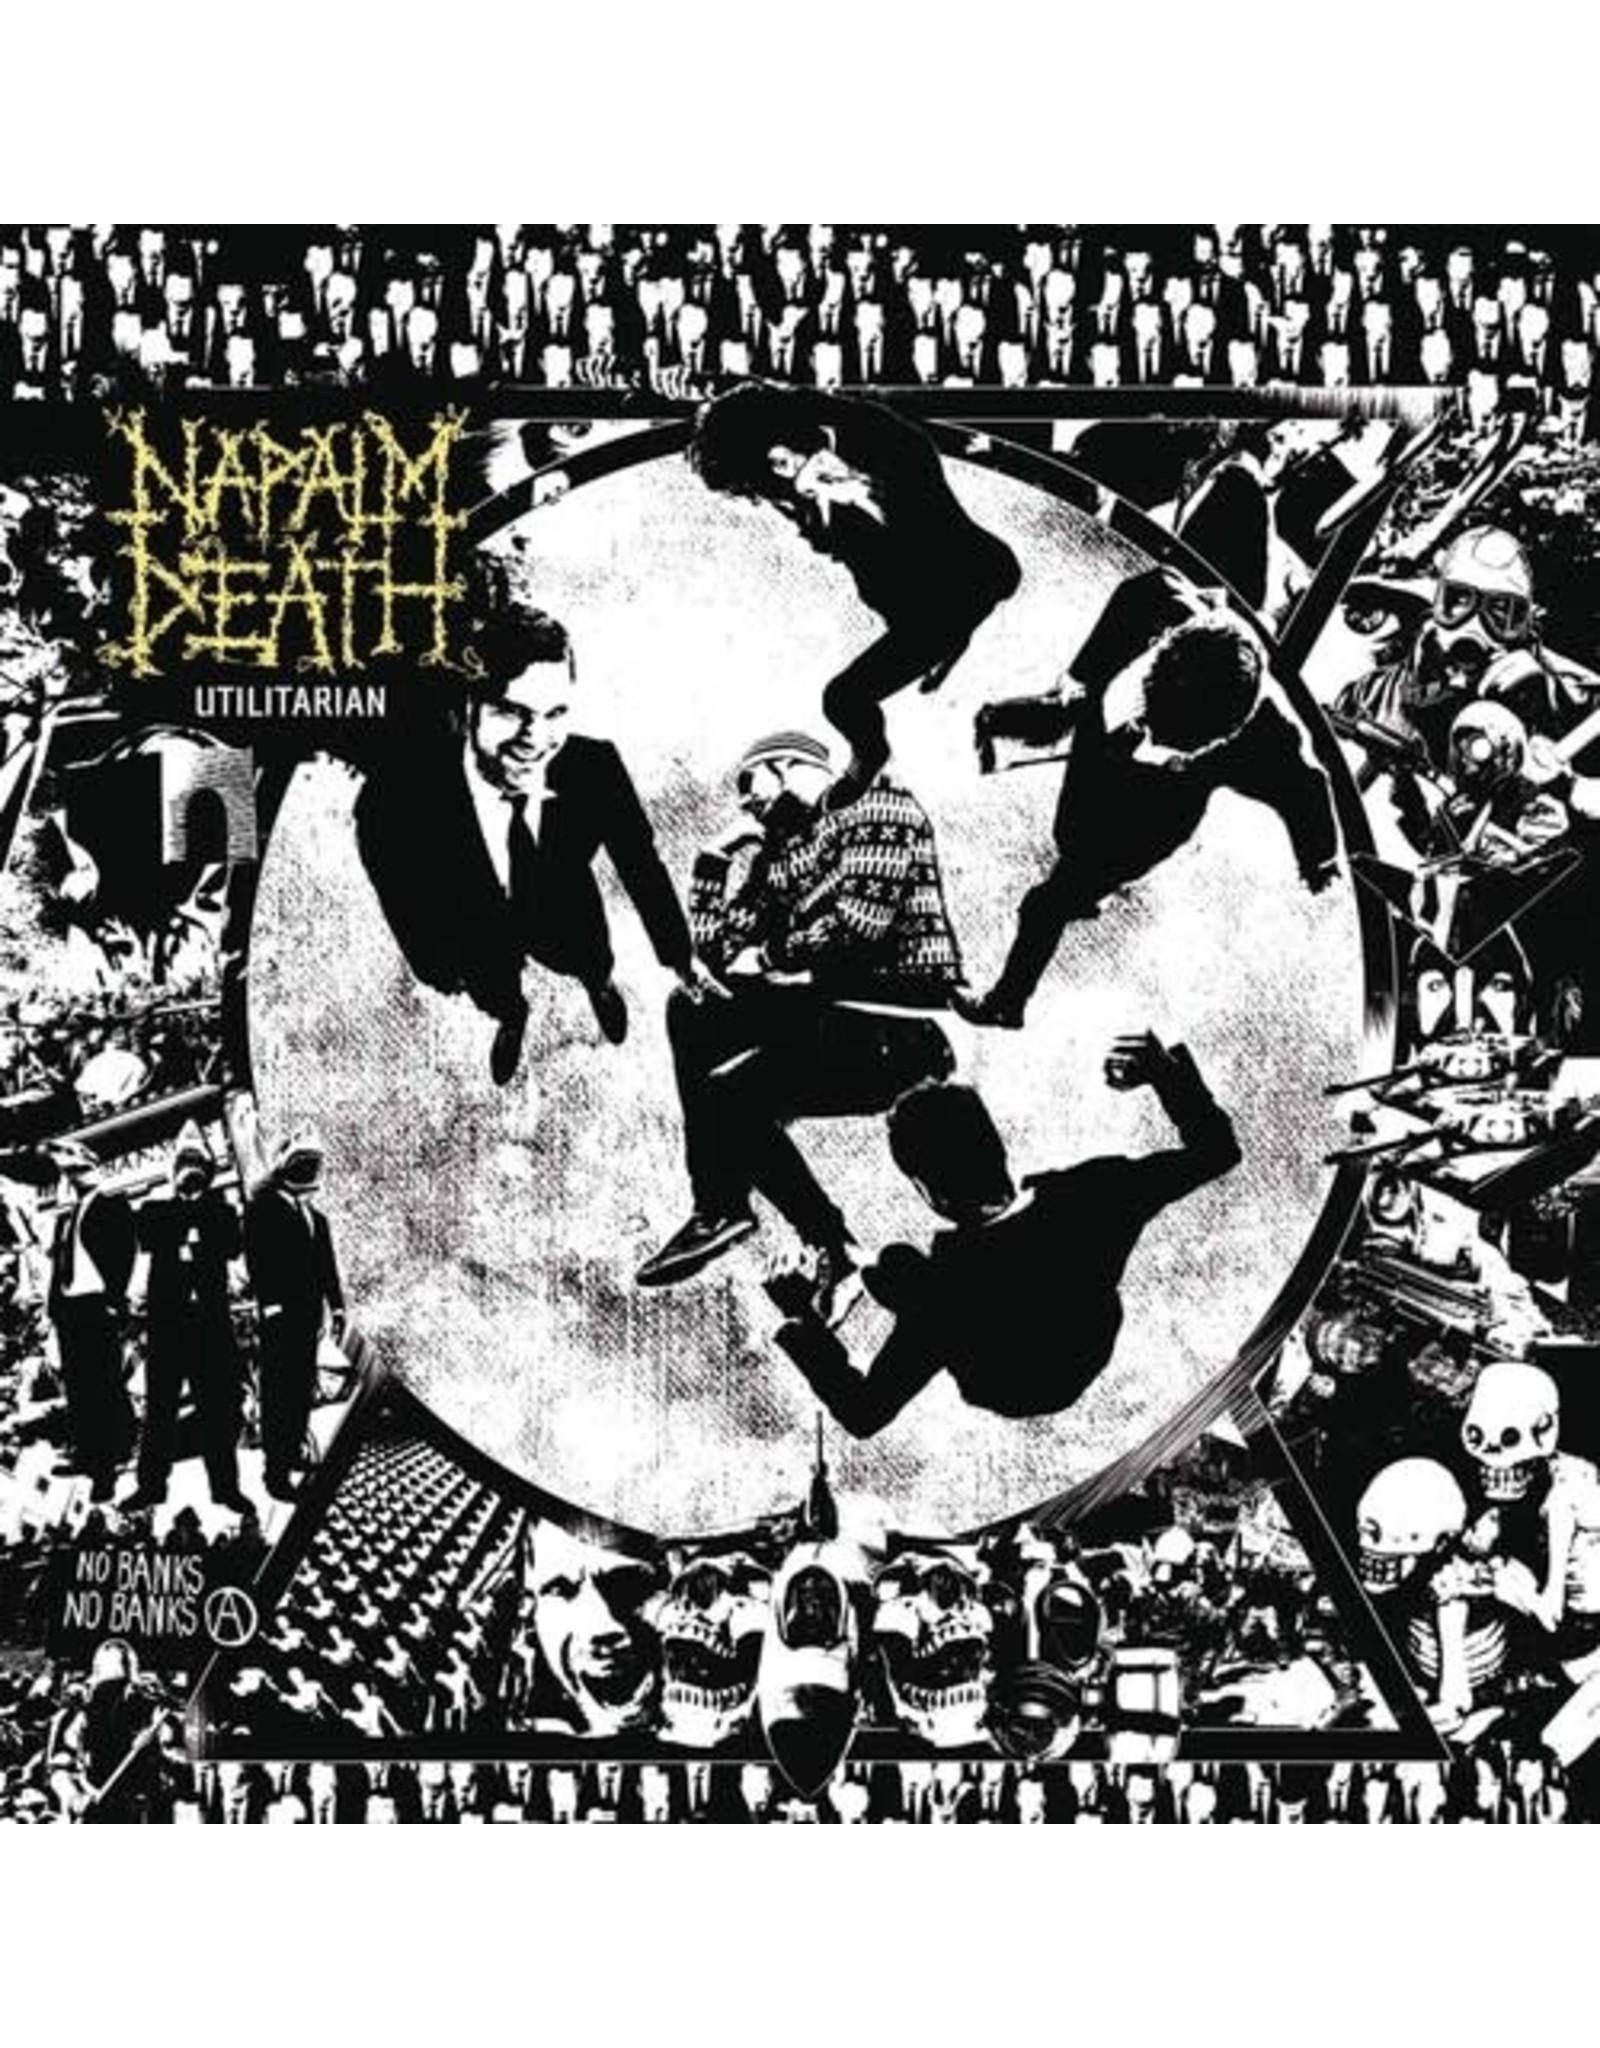 New Vinyl Napalm Death - Utilitarian [Germany Import] LP